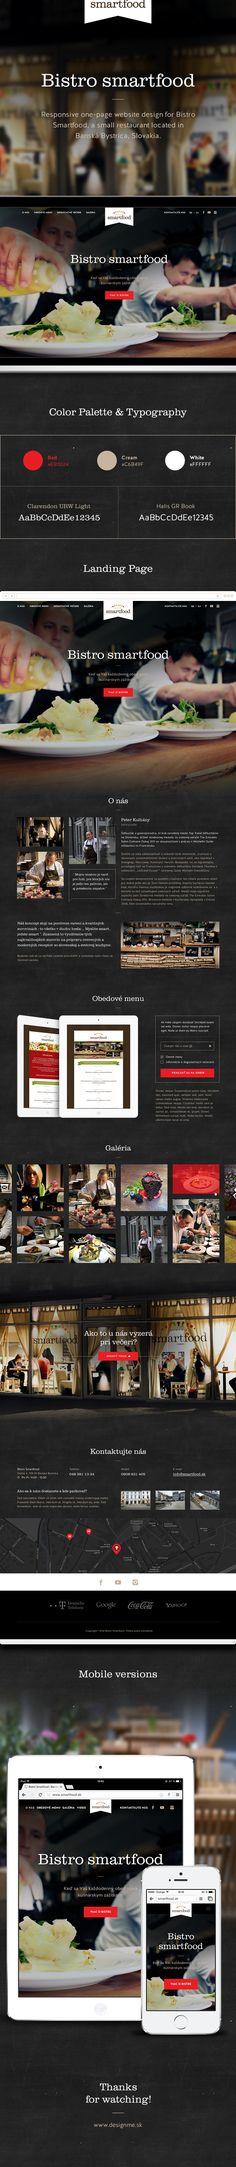 Bistro Smartfood Website by Marek Levak, via Behance